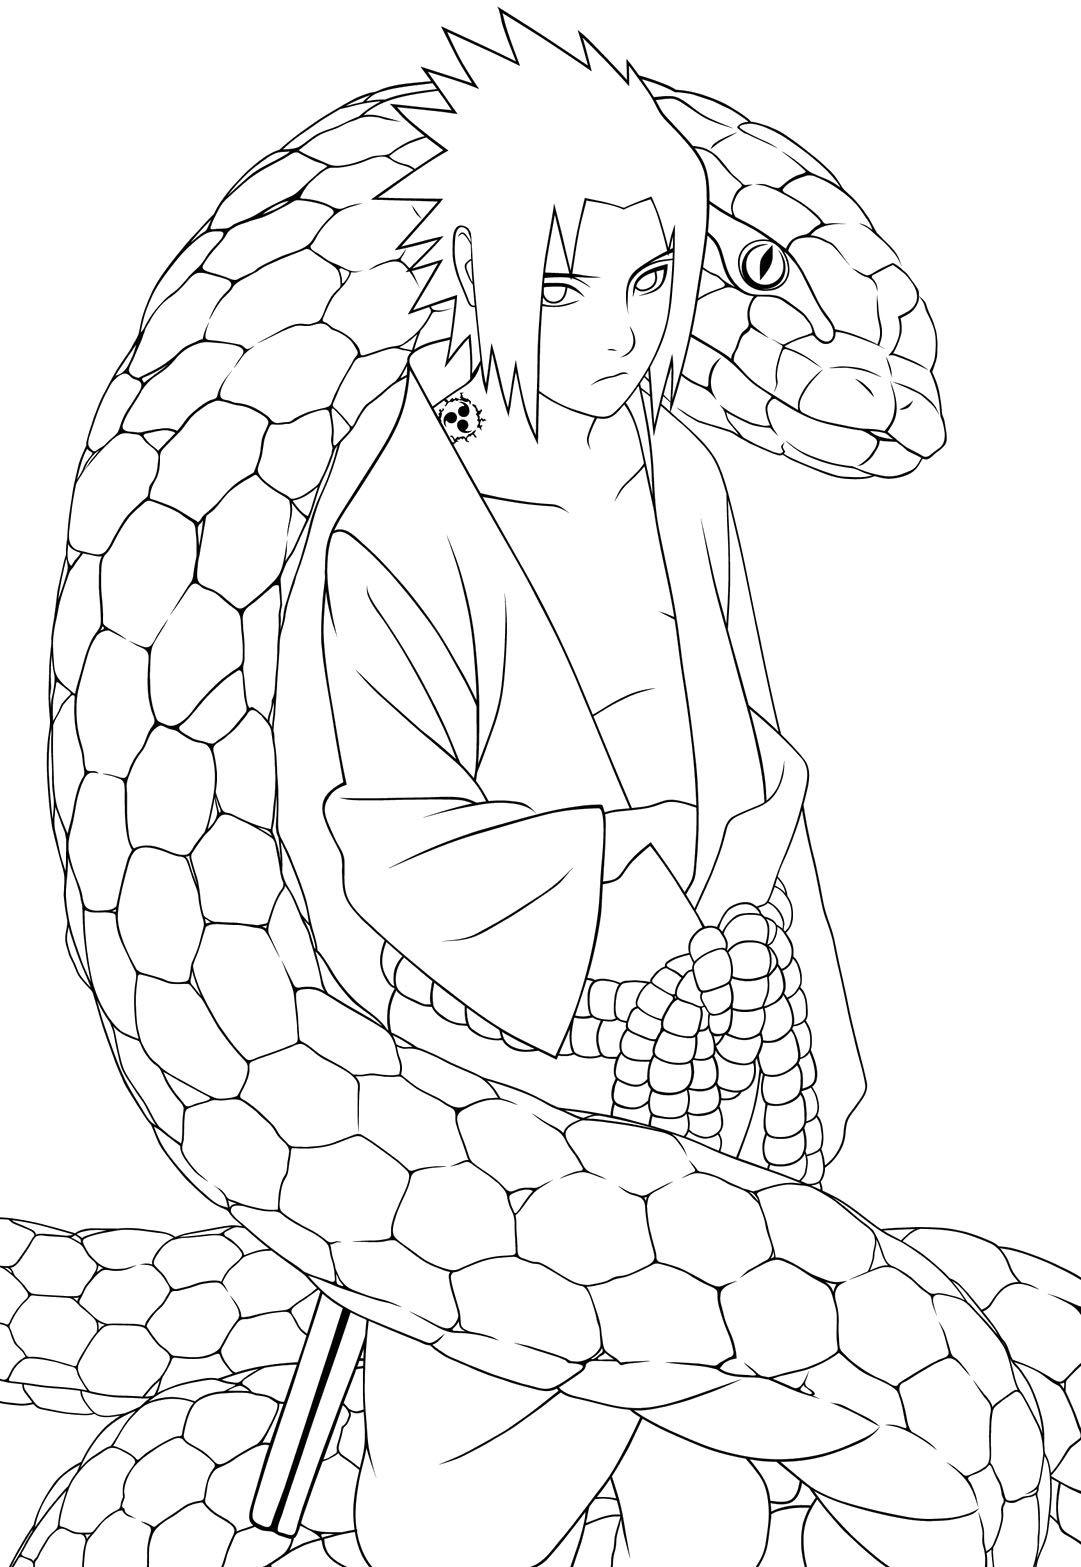 Naruto Shippuden additionally 11 furthermore Coloriage Ch C3 A8vre Sur La Prairie in addition Sketch Baby Satoshi For A Mini Doujinshi 554666167 moreover 3143971456 Blagues De Trolls. on sasuke and sakura